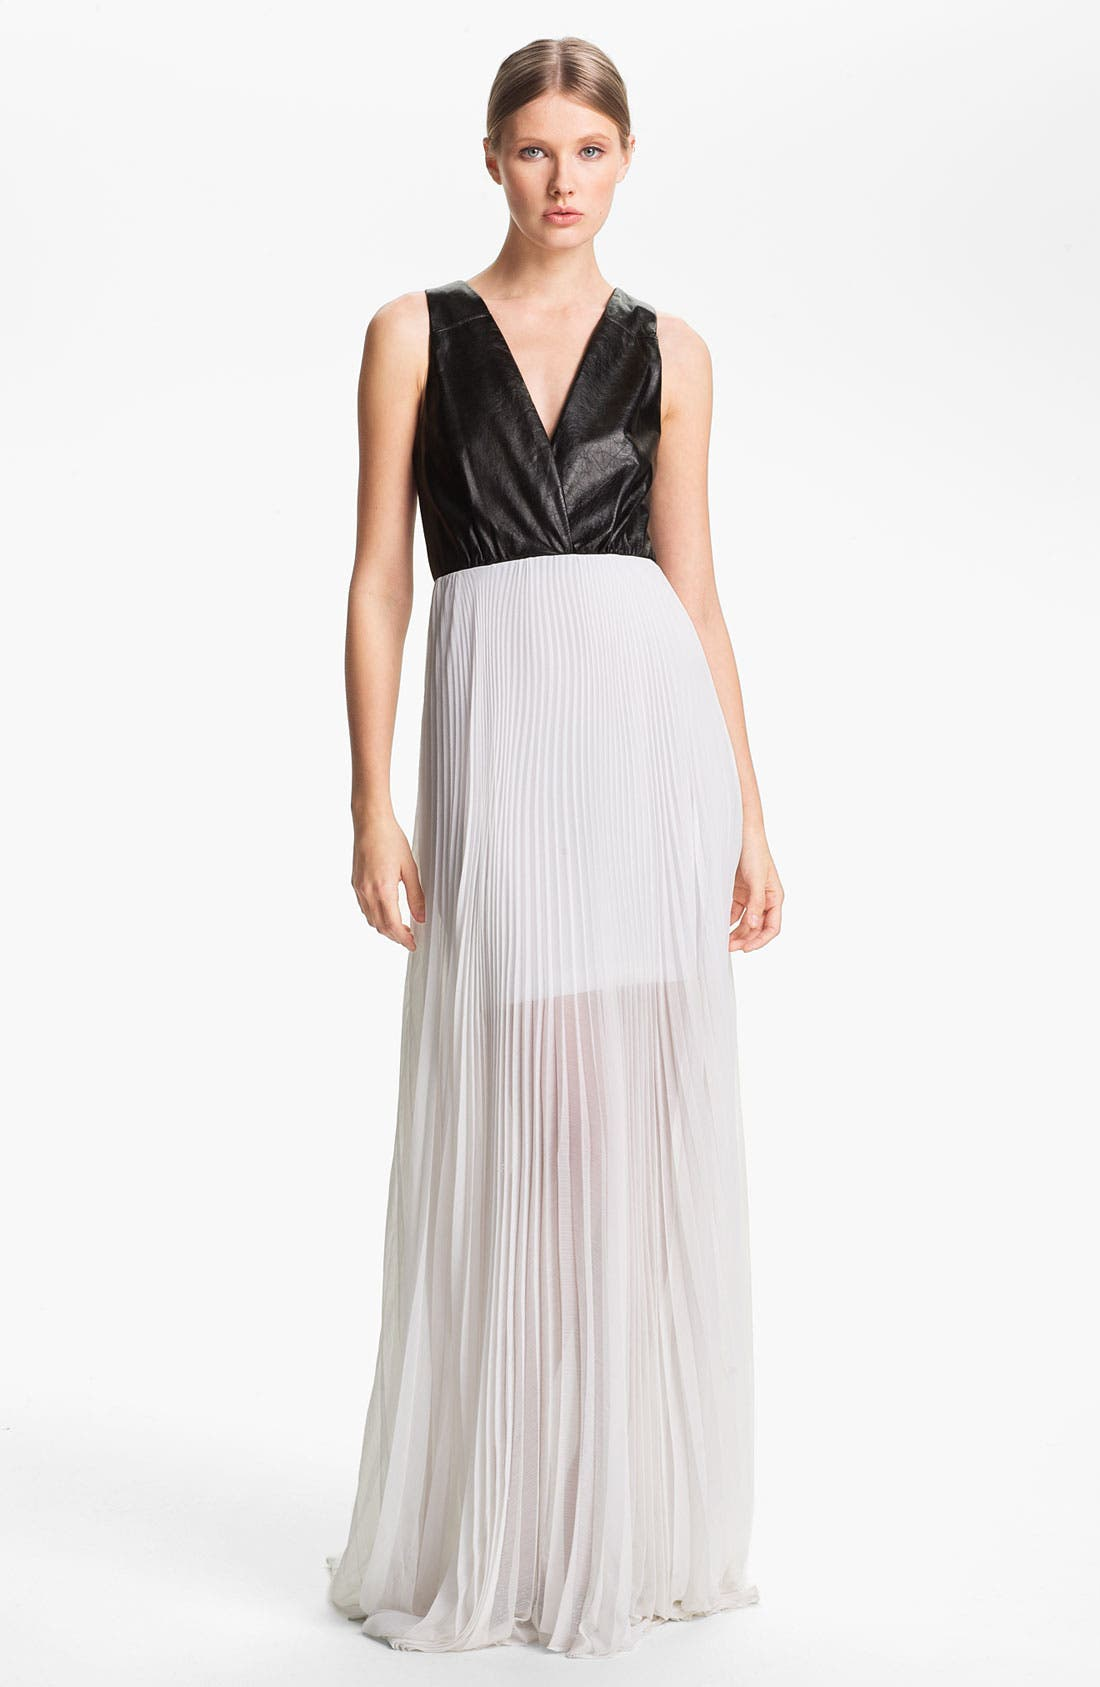 ALICE + OLIVIA,                             Leather Bodice & Chiffon Dress,                             Main thumbnail 1, color,                             009